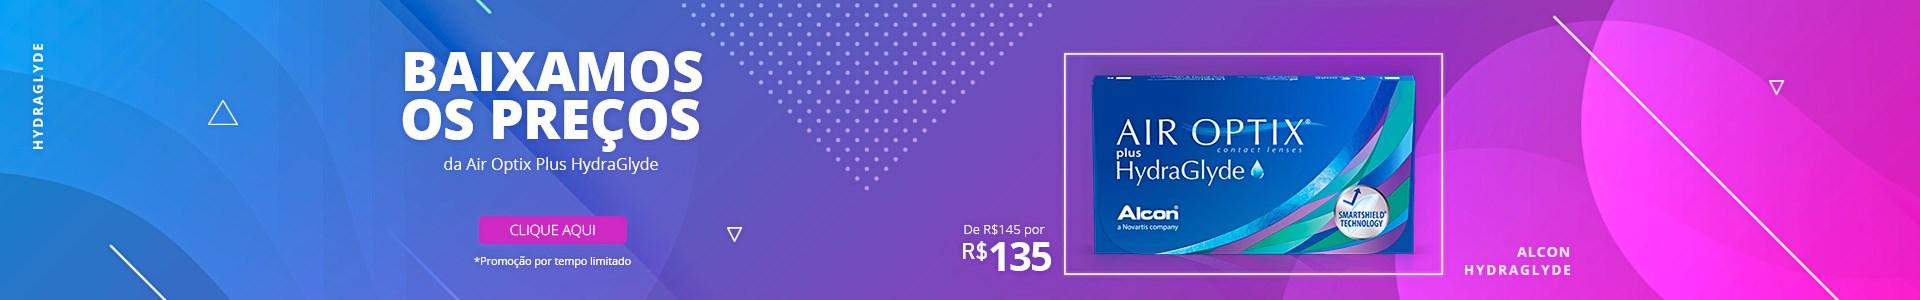 Air Optix Plus HydraGlyde de R$145 por R$135